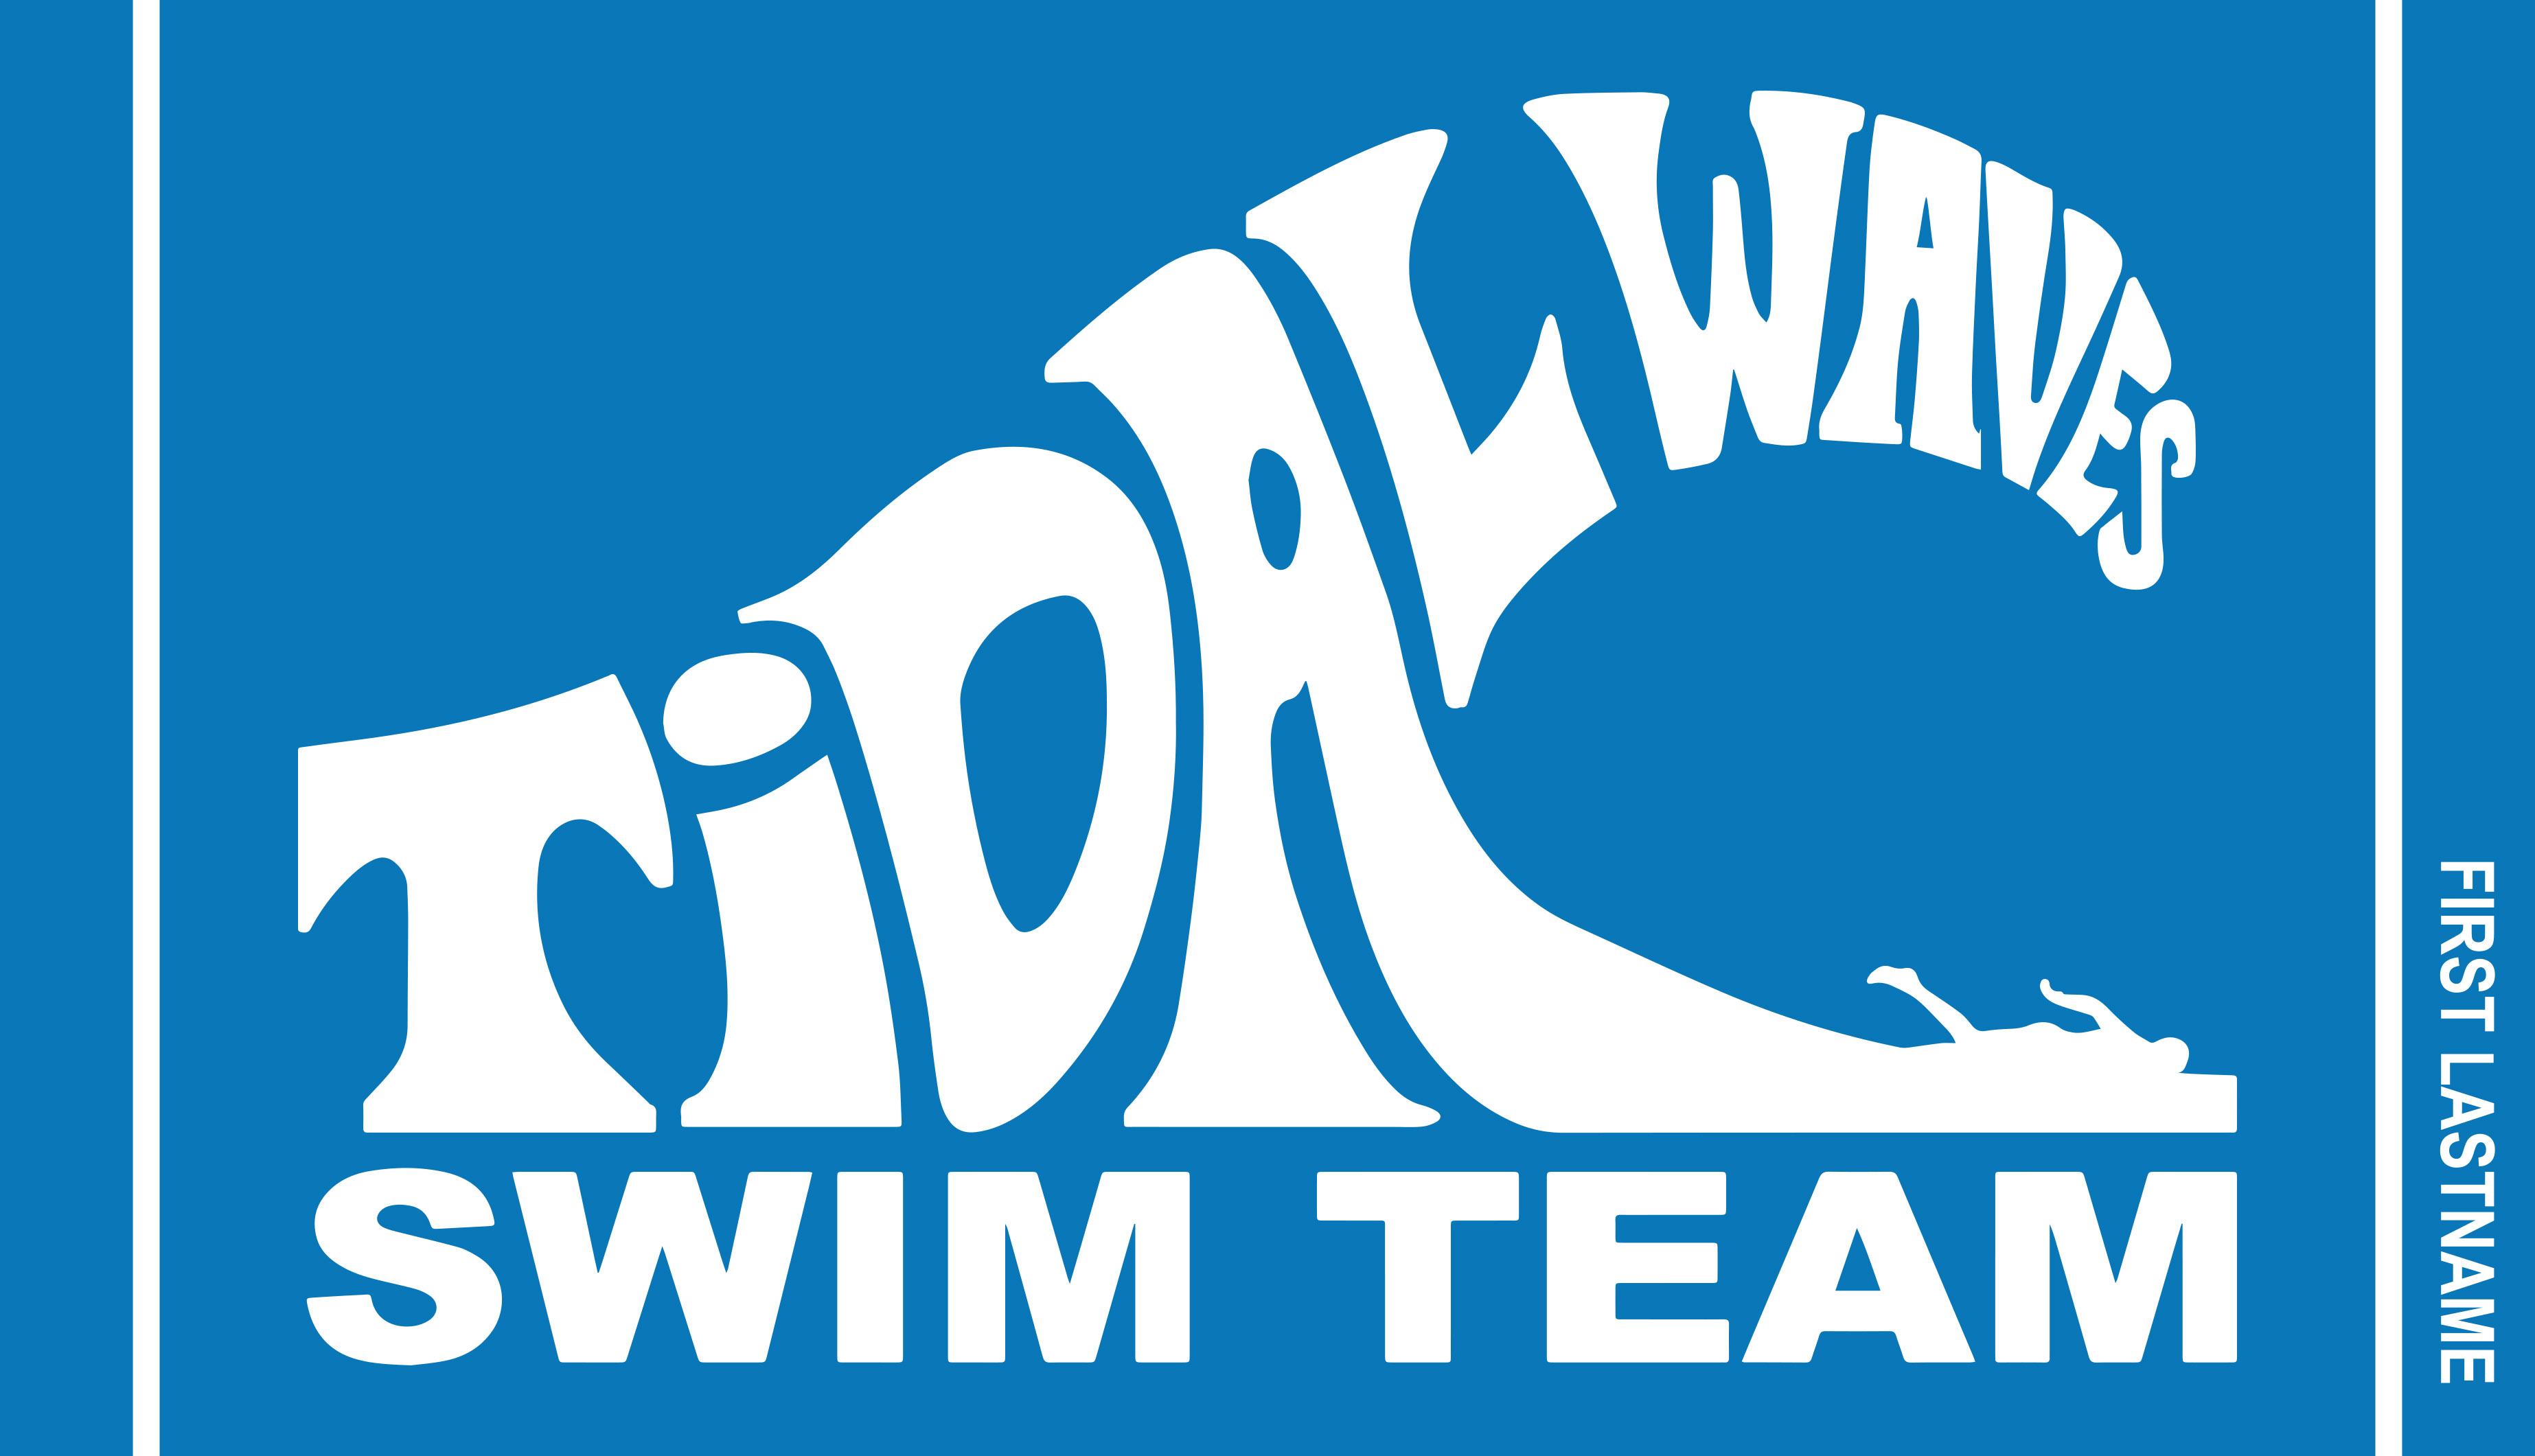 00551-TidalWavesSwimTeam-34x60_V1-PROOF